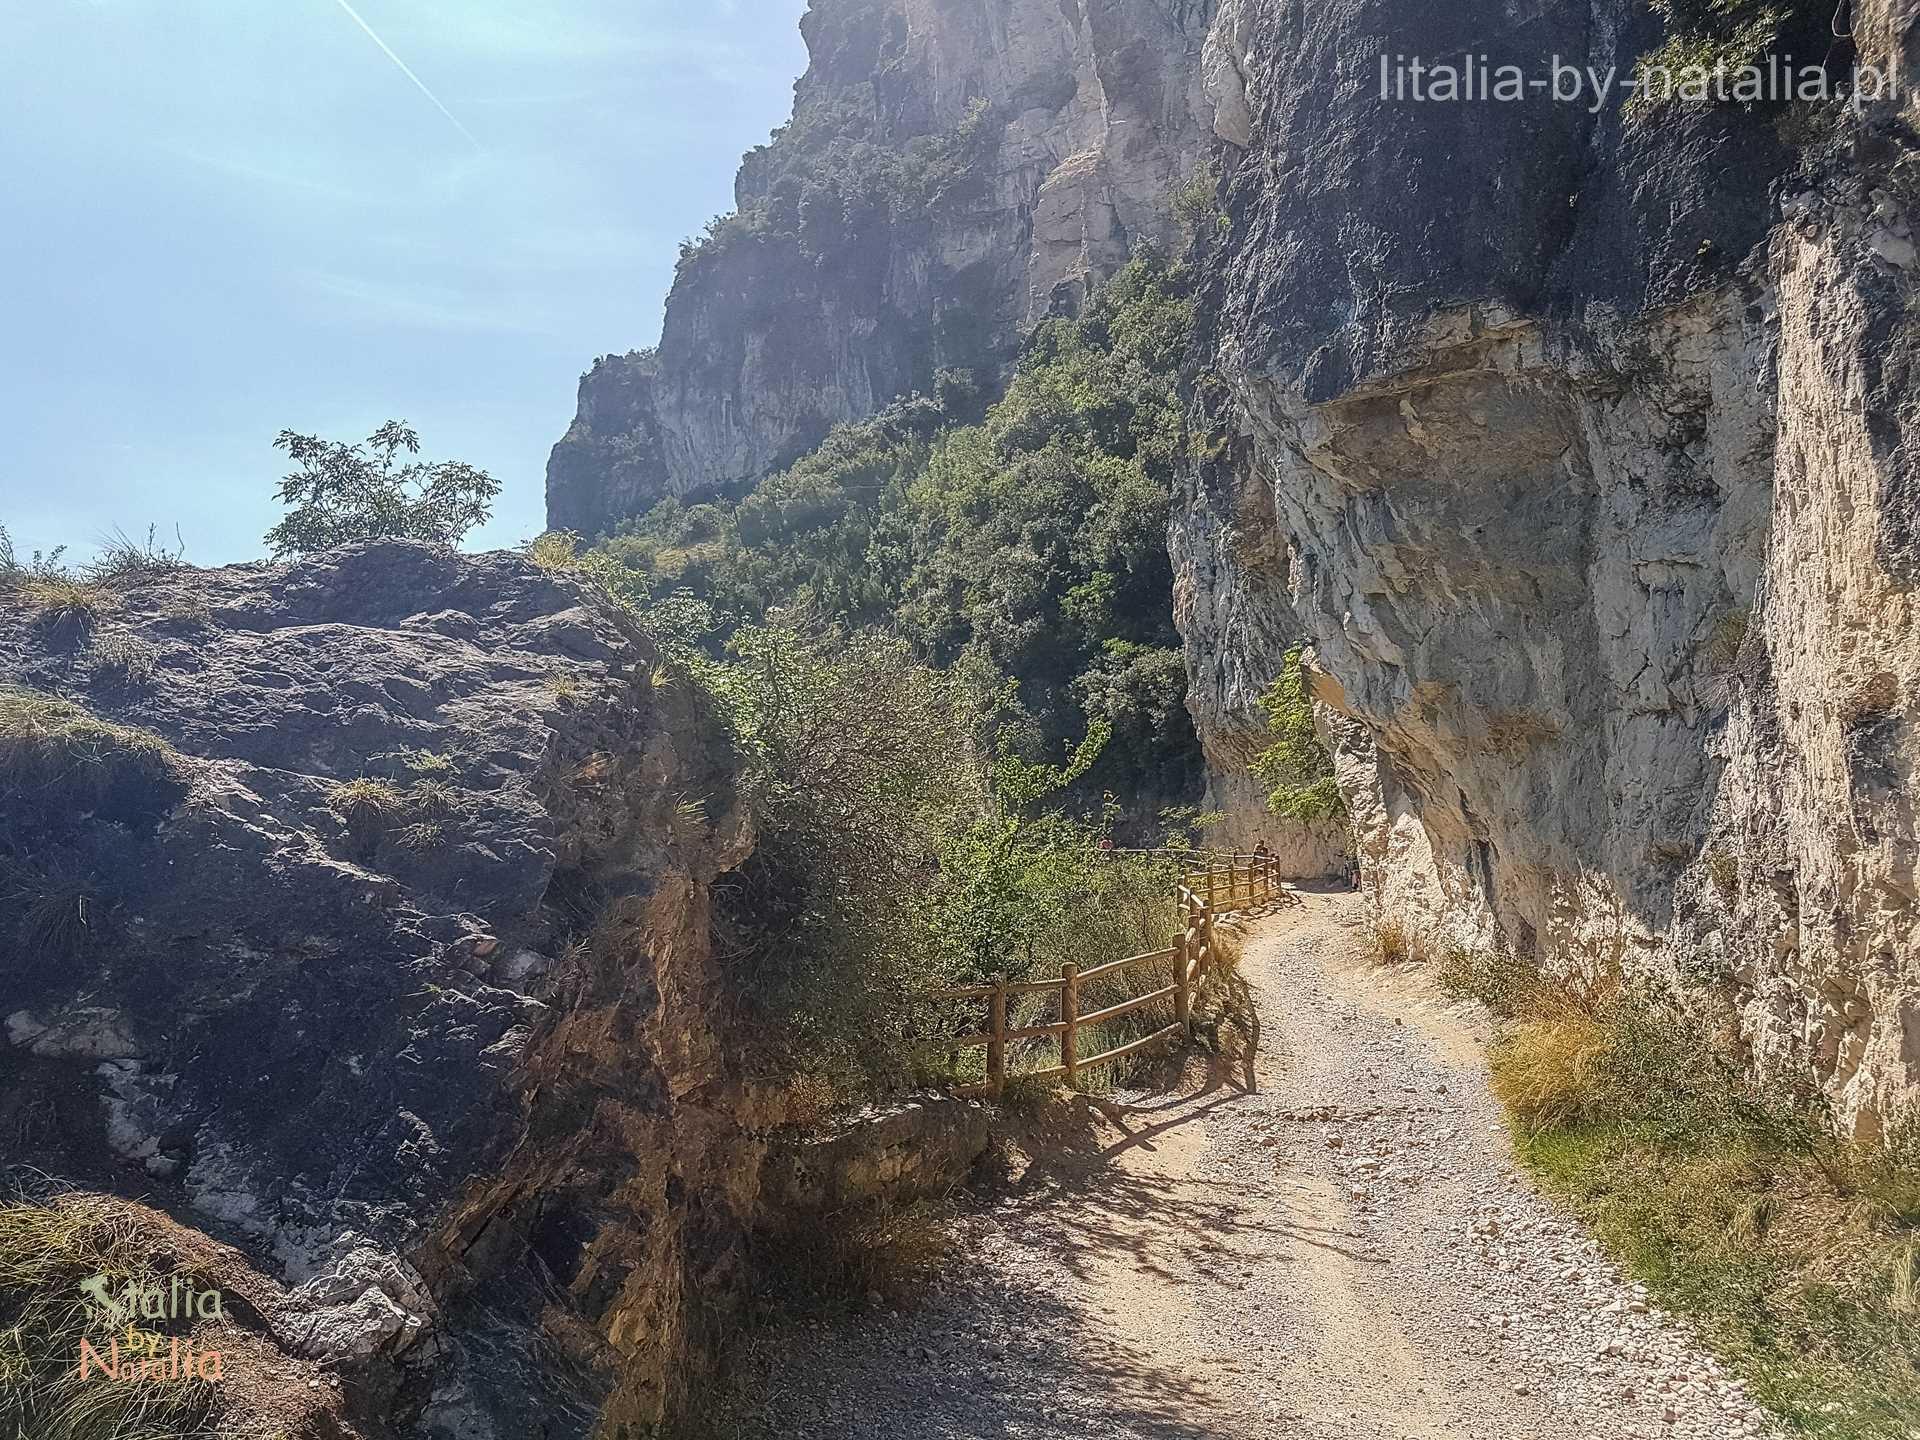 Strada del Ponale Garda kolarstwo górskie szlak panoramiczny spacer trekking